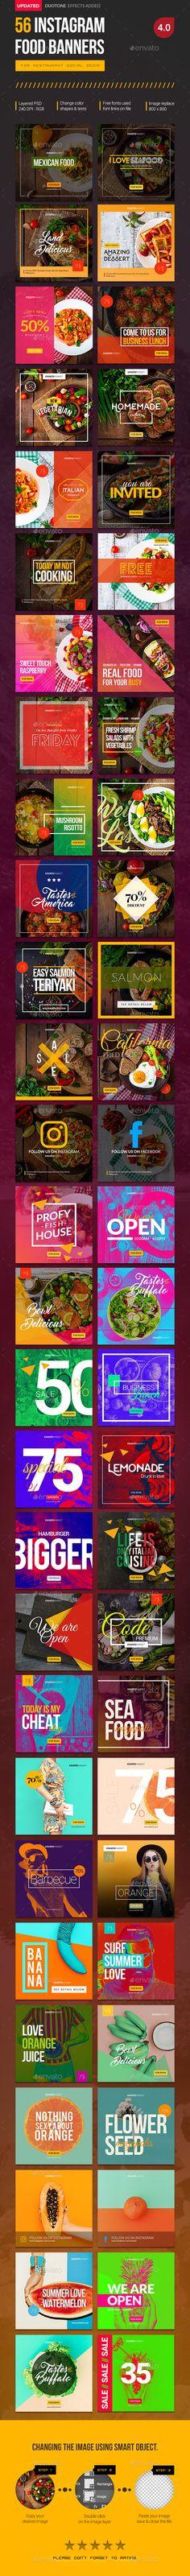 56 Instagram Food Banners - Social Media Web Elements